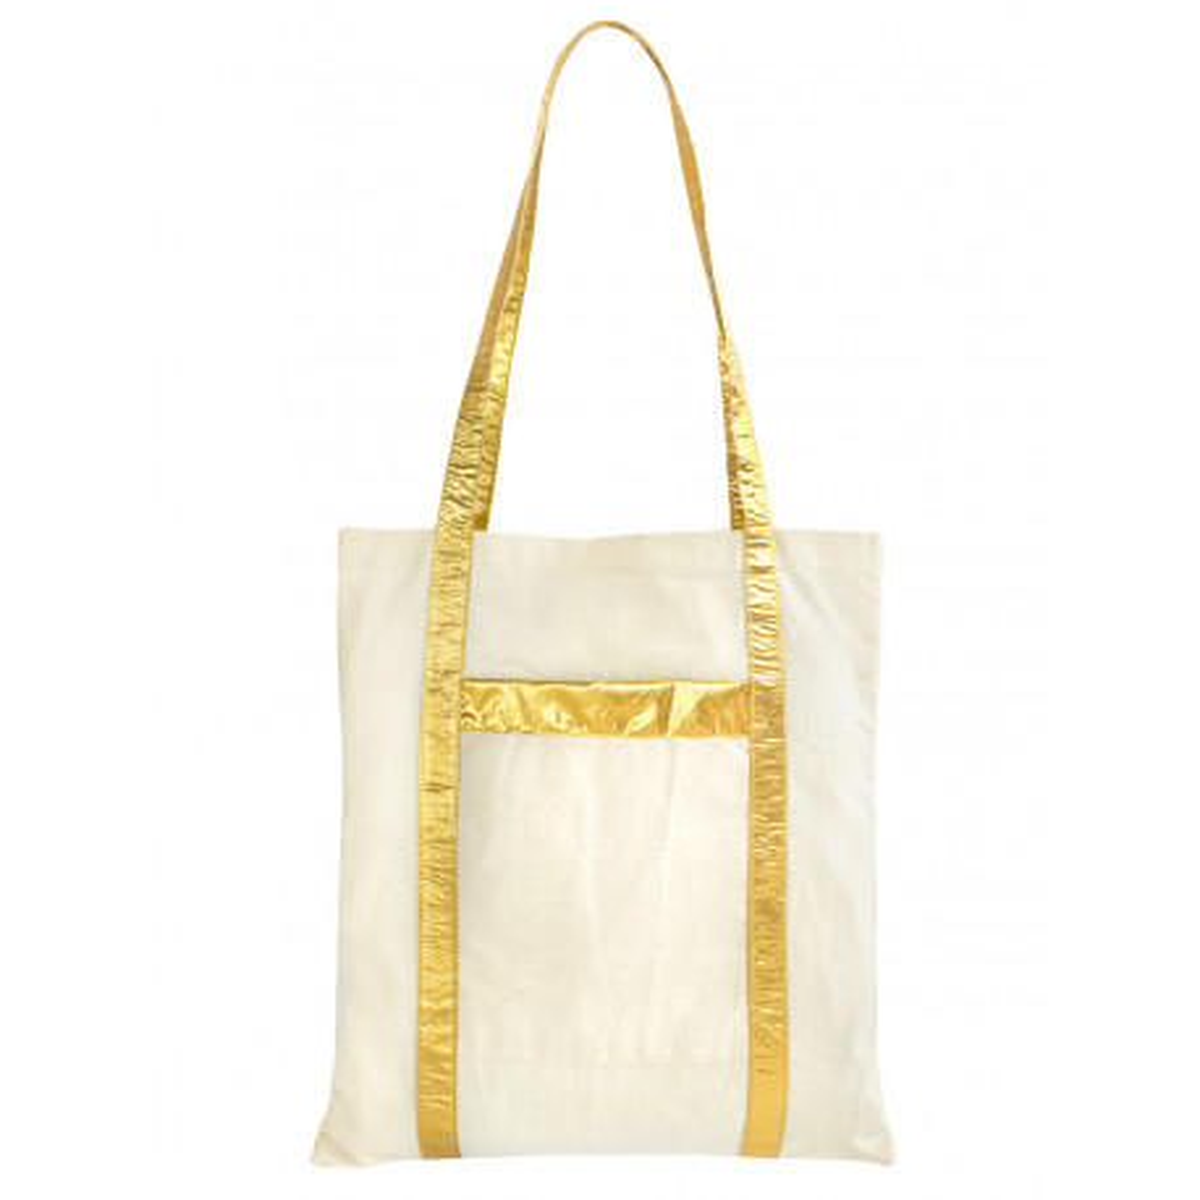 Tote bag sac coton écru et or